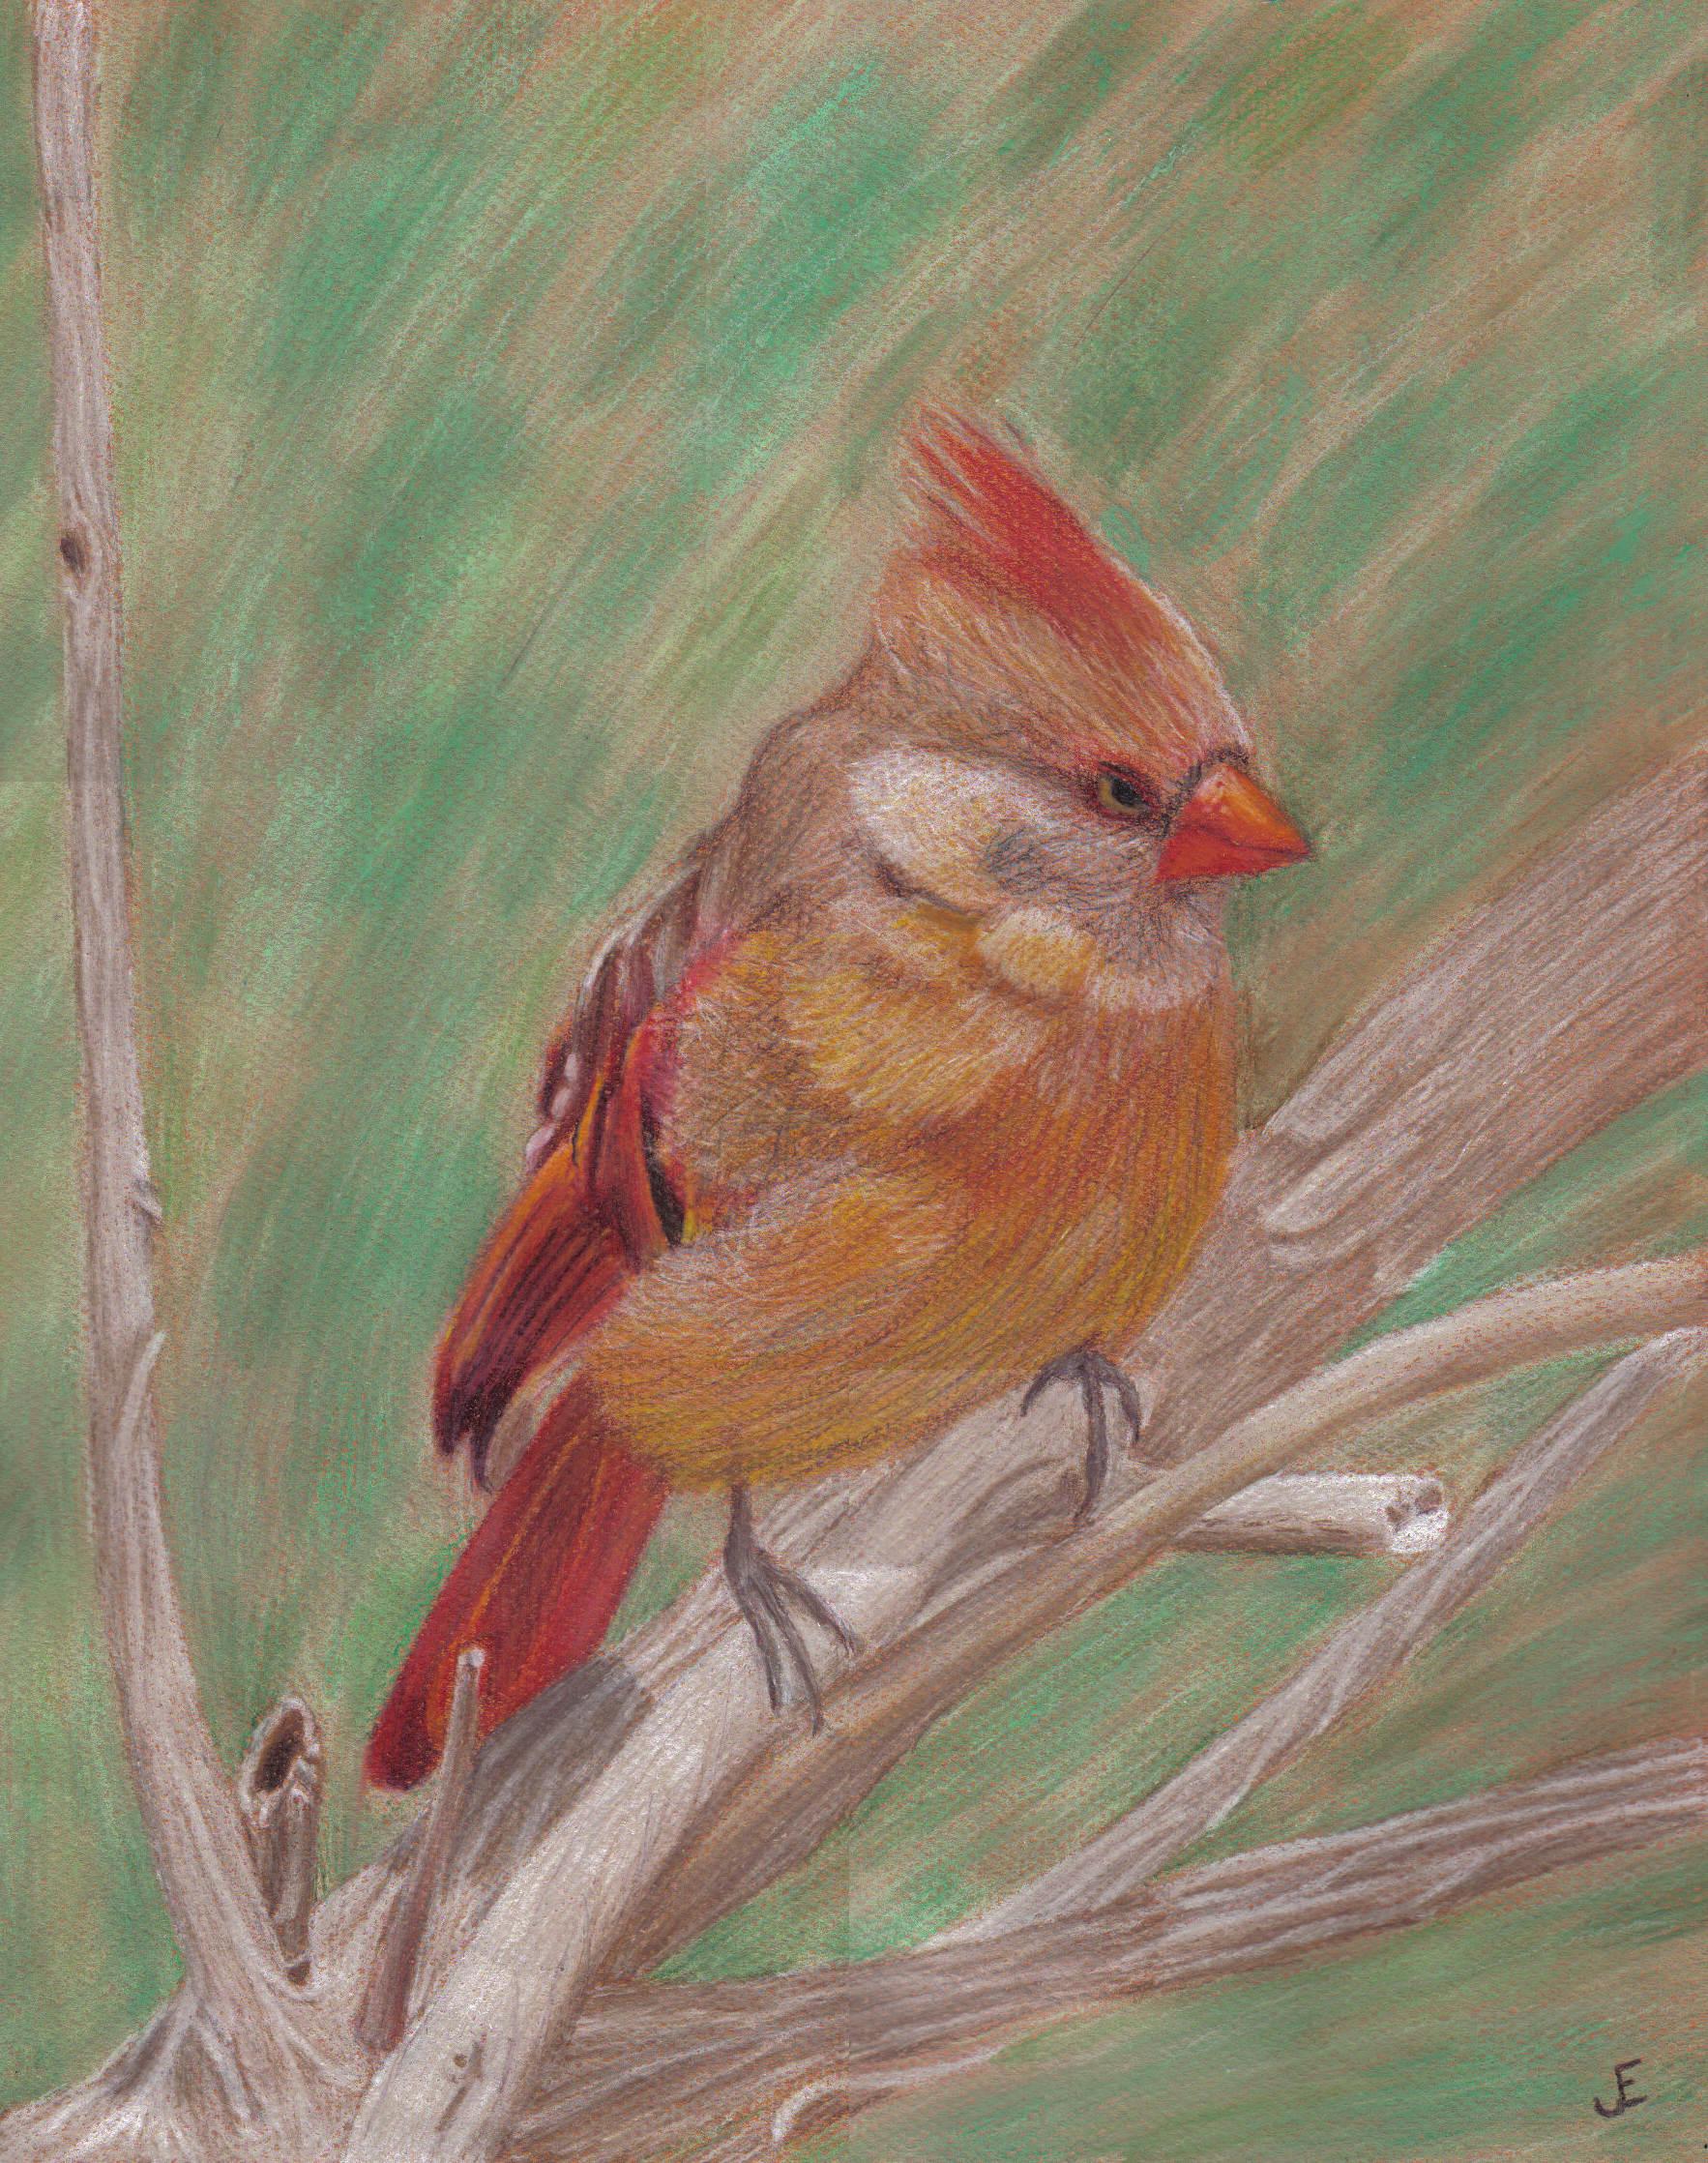 Cardinal in the Brush